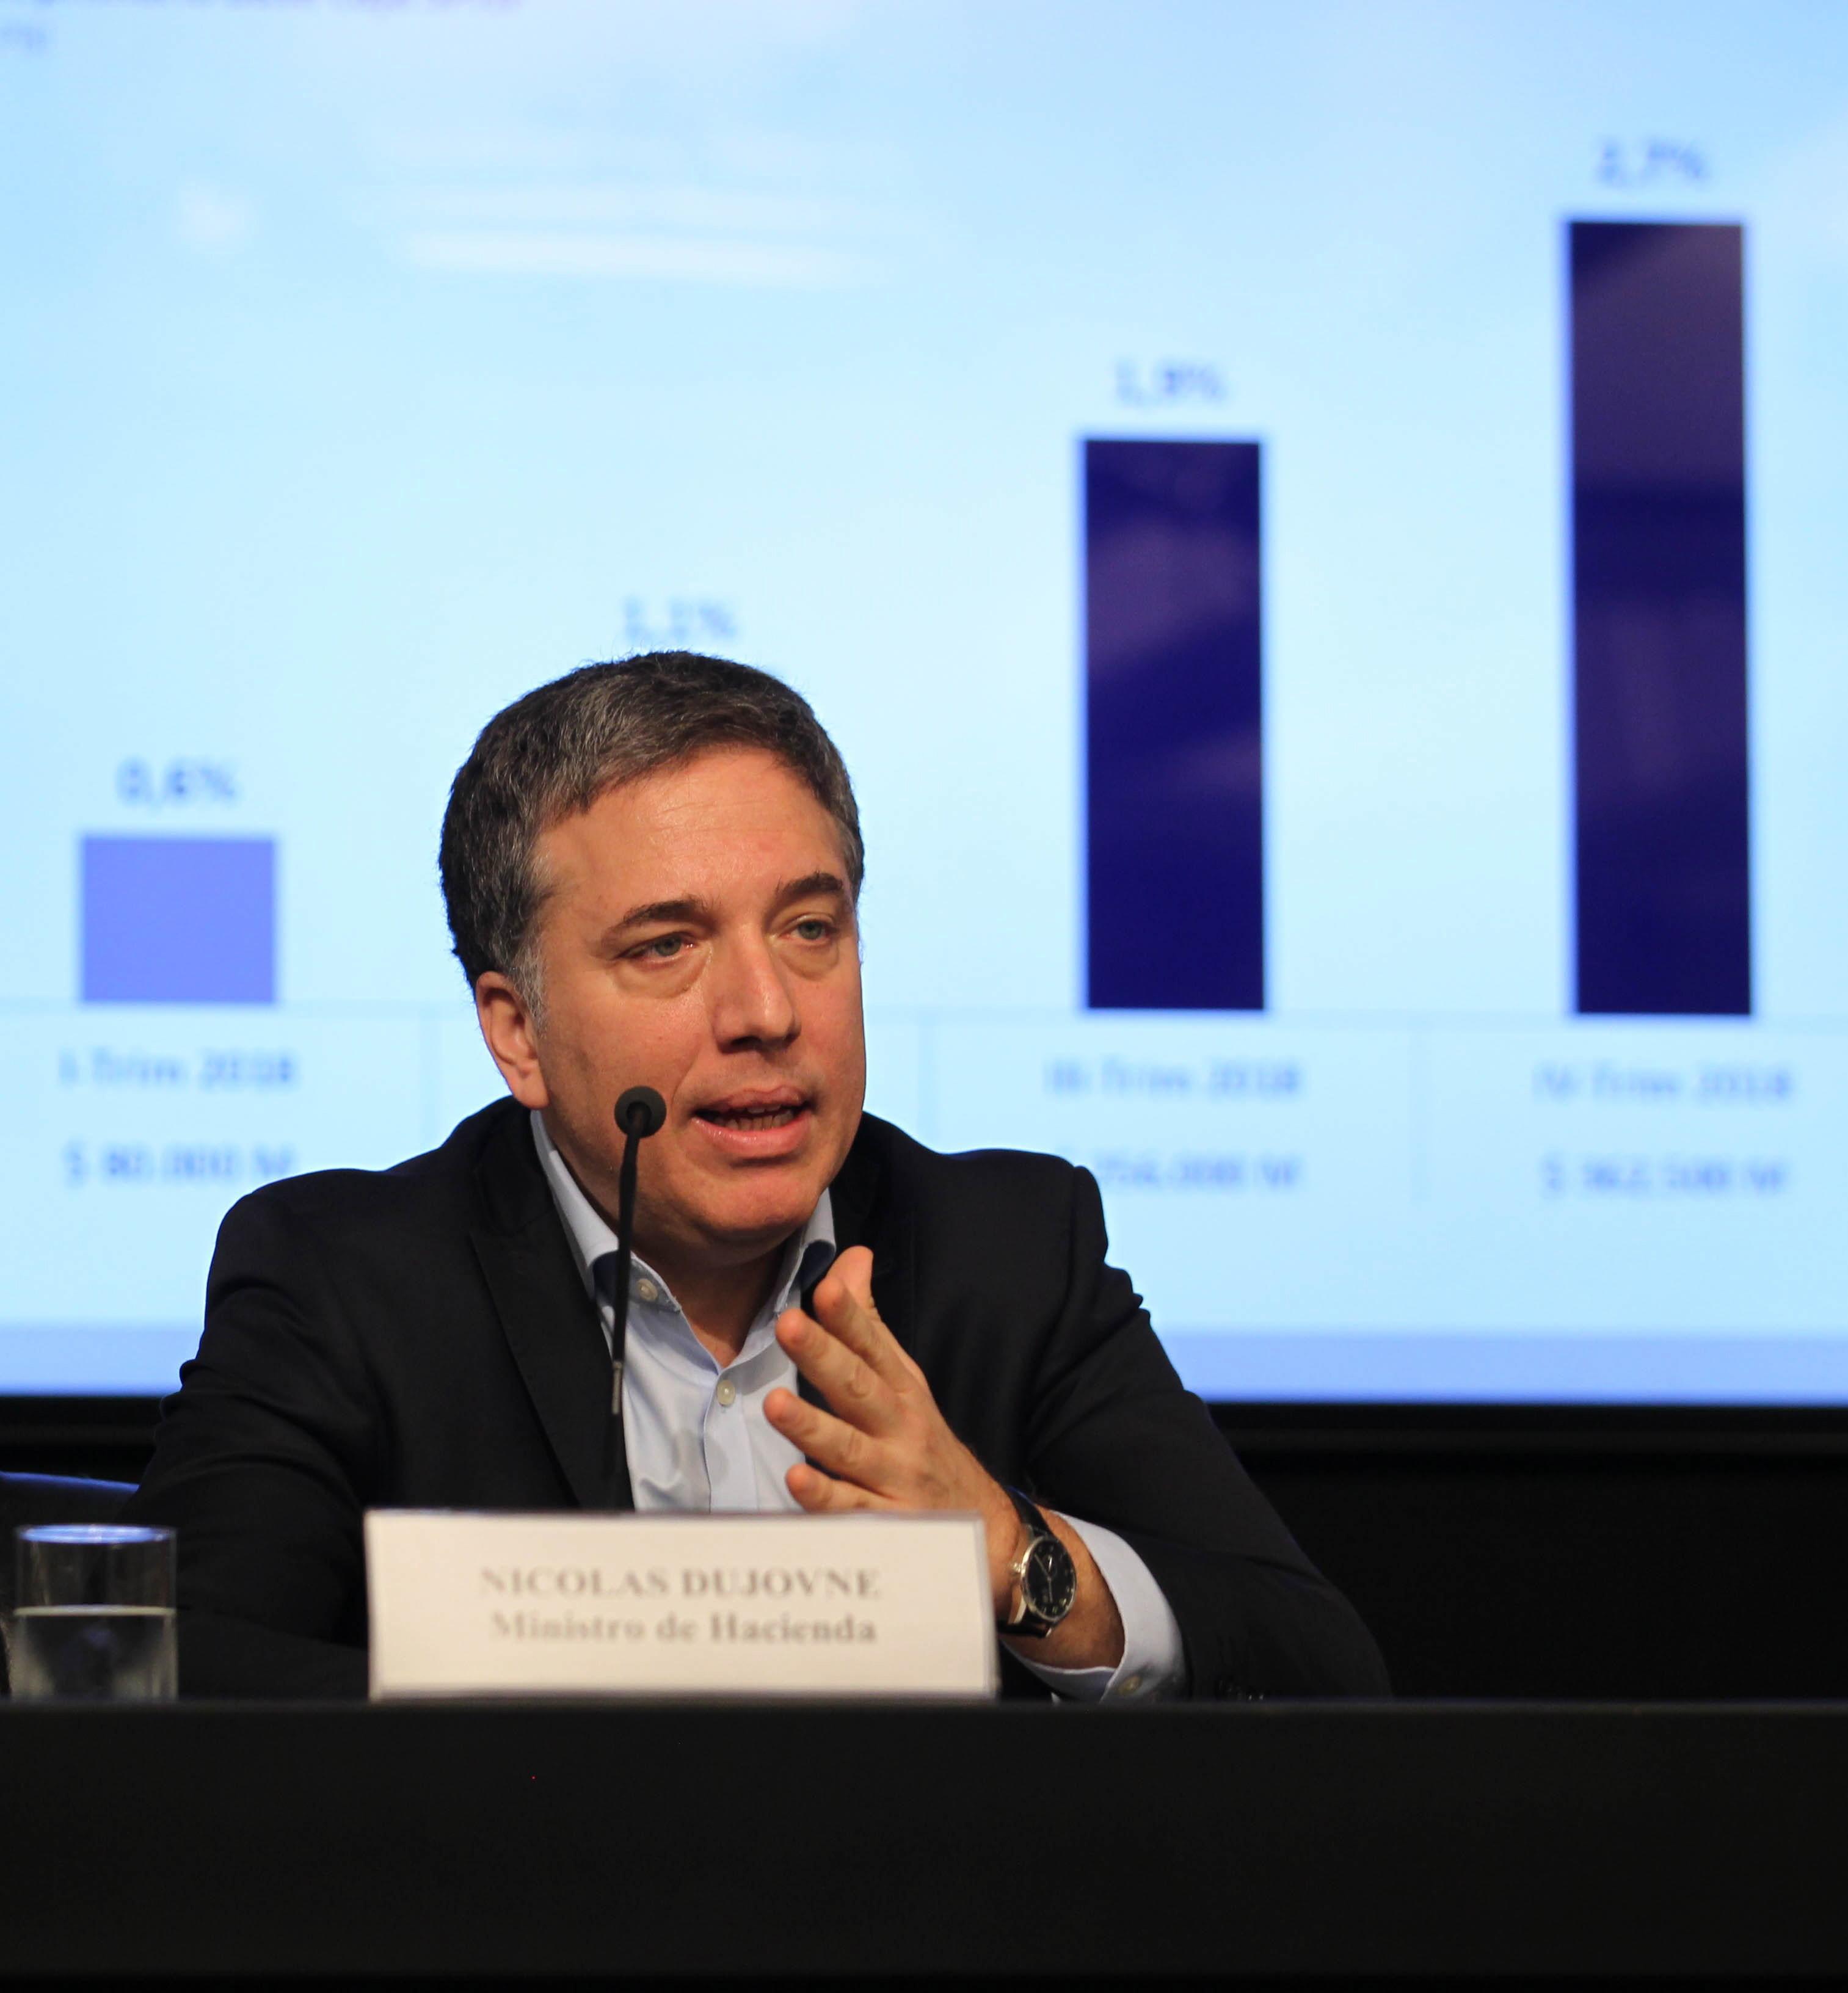 Ministro da Economia argentino renuncia no meio de crise político-económica